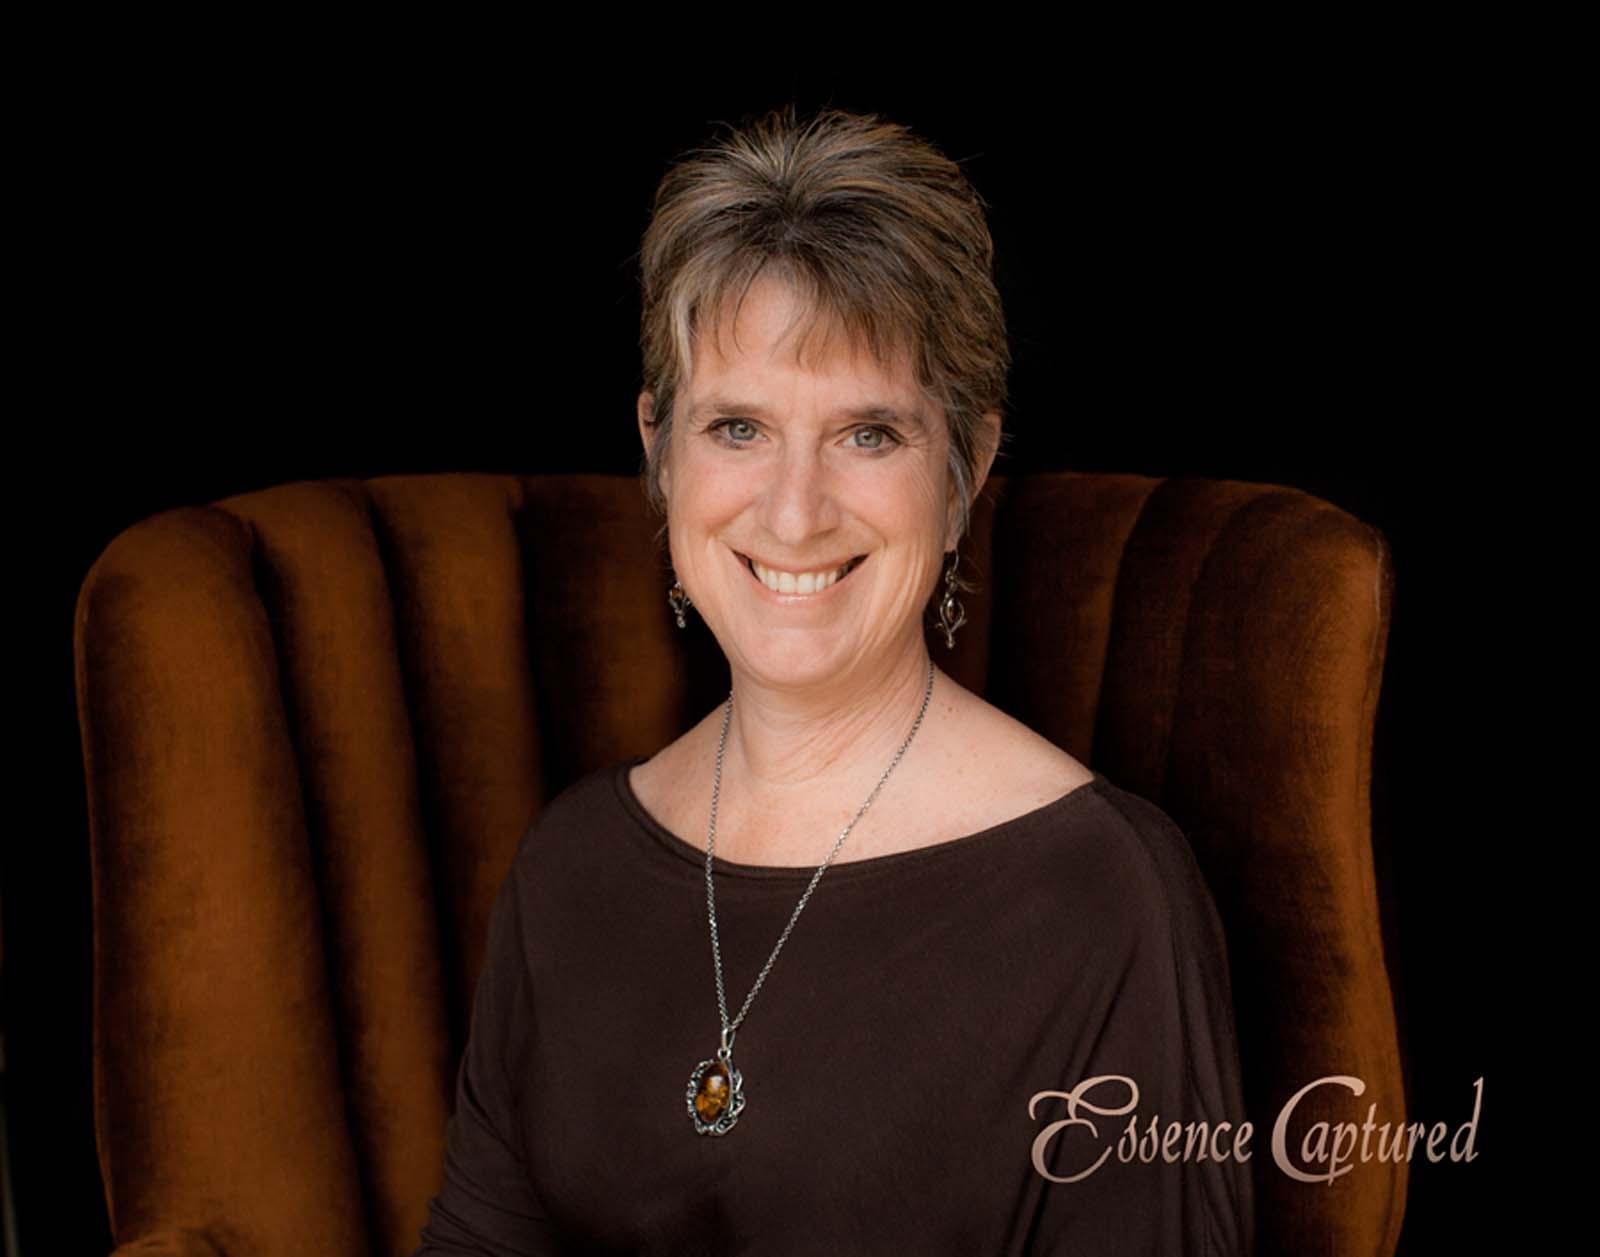 female portrait short hair elegant browns and bronze colors